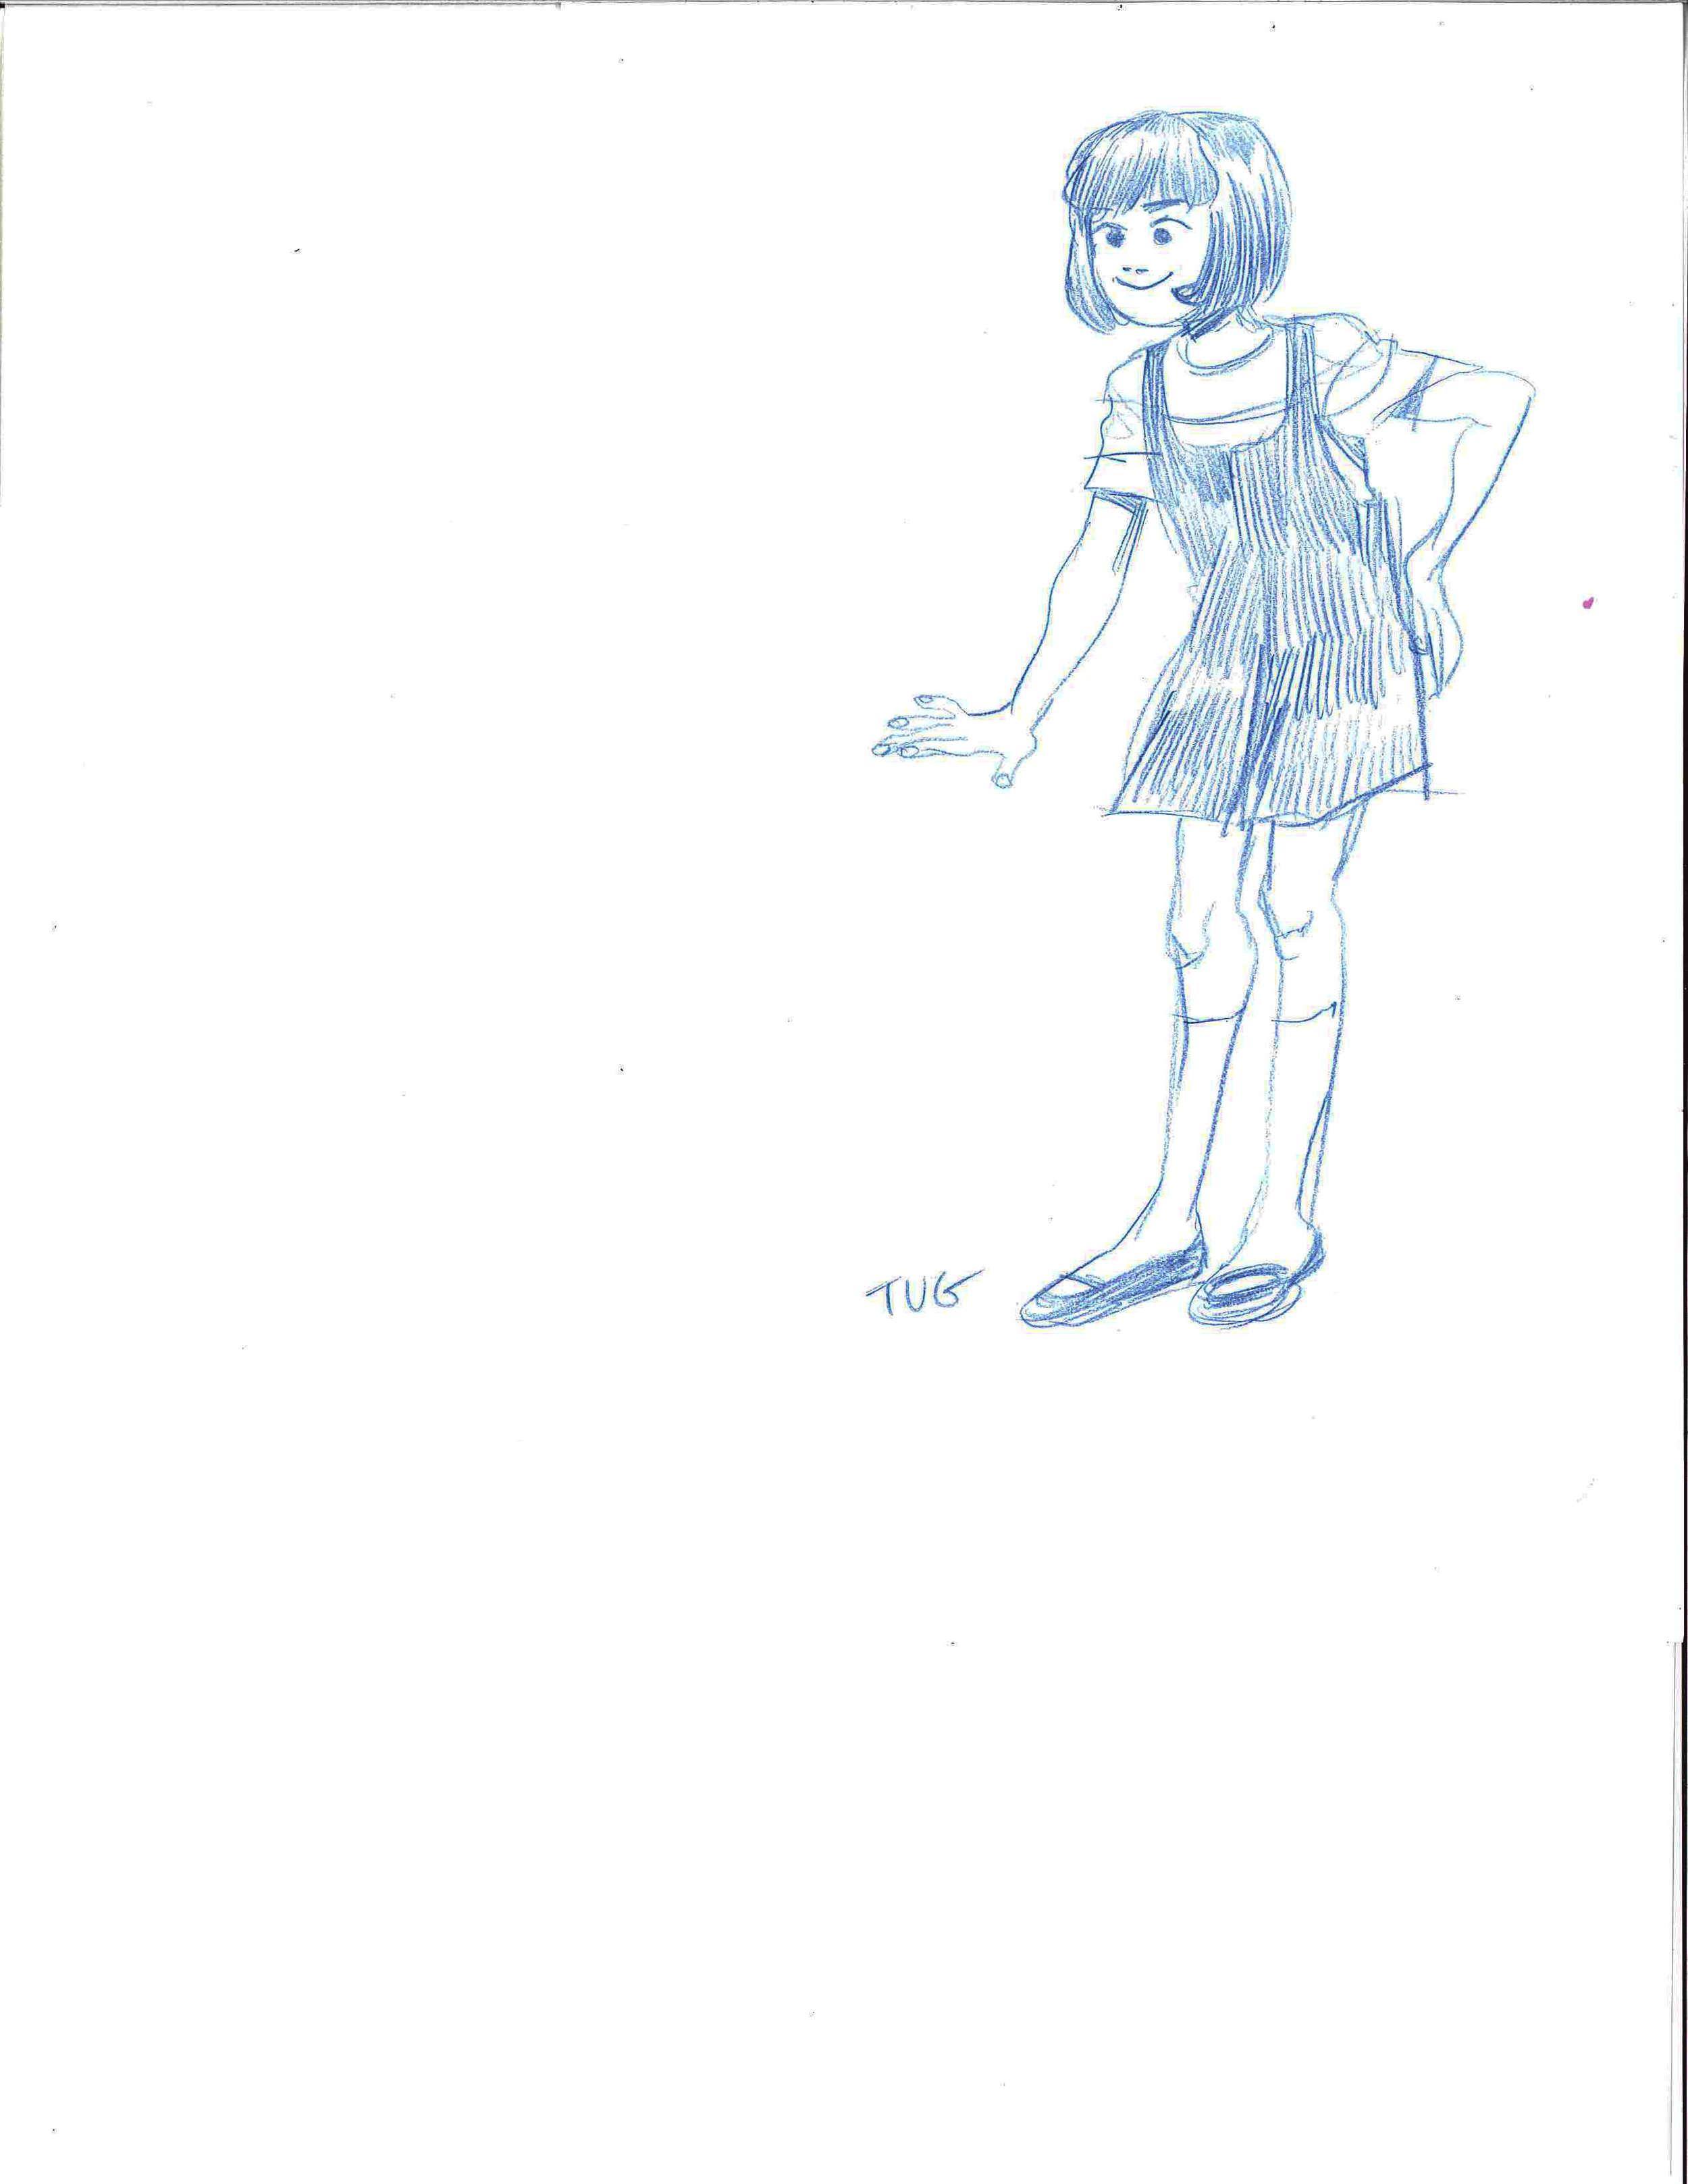 ramona live sketches color-6.jpg